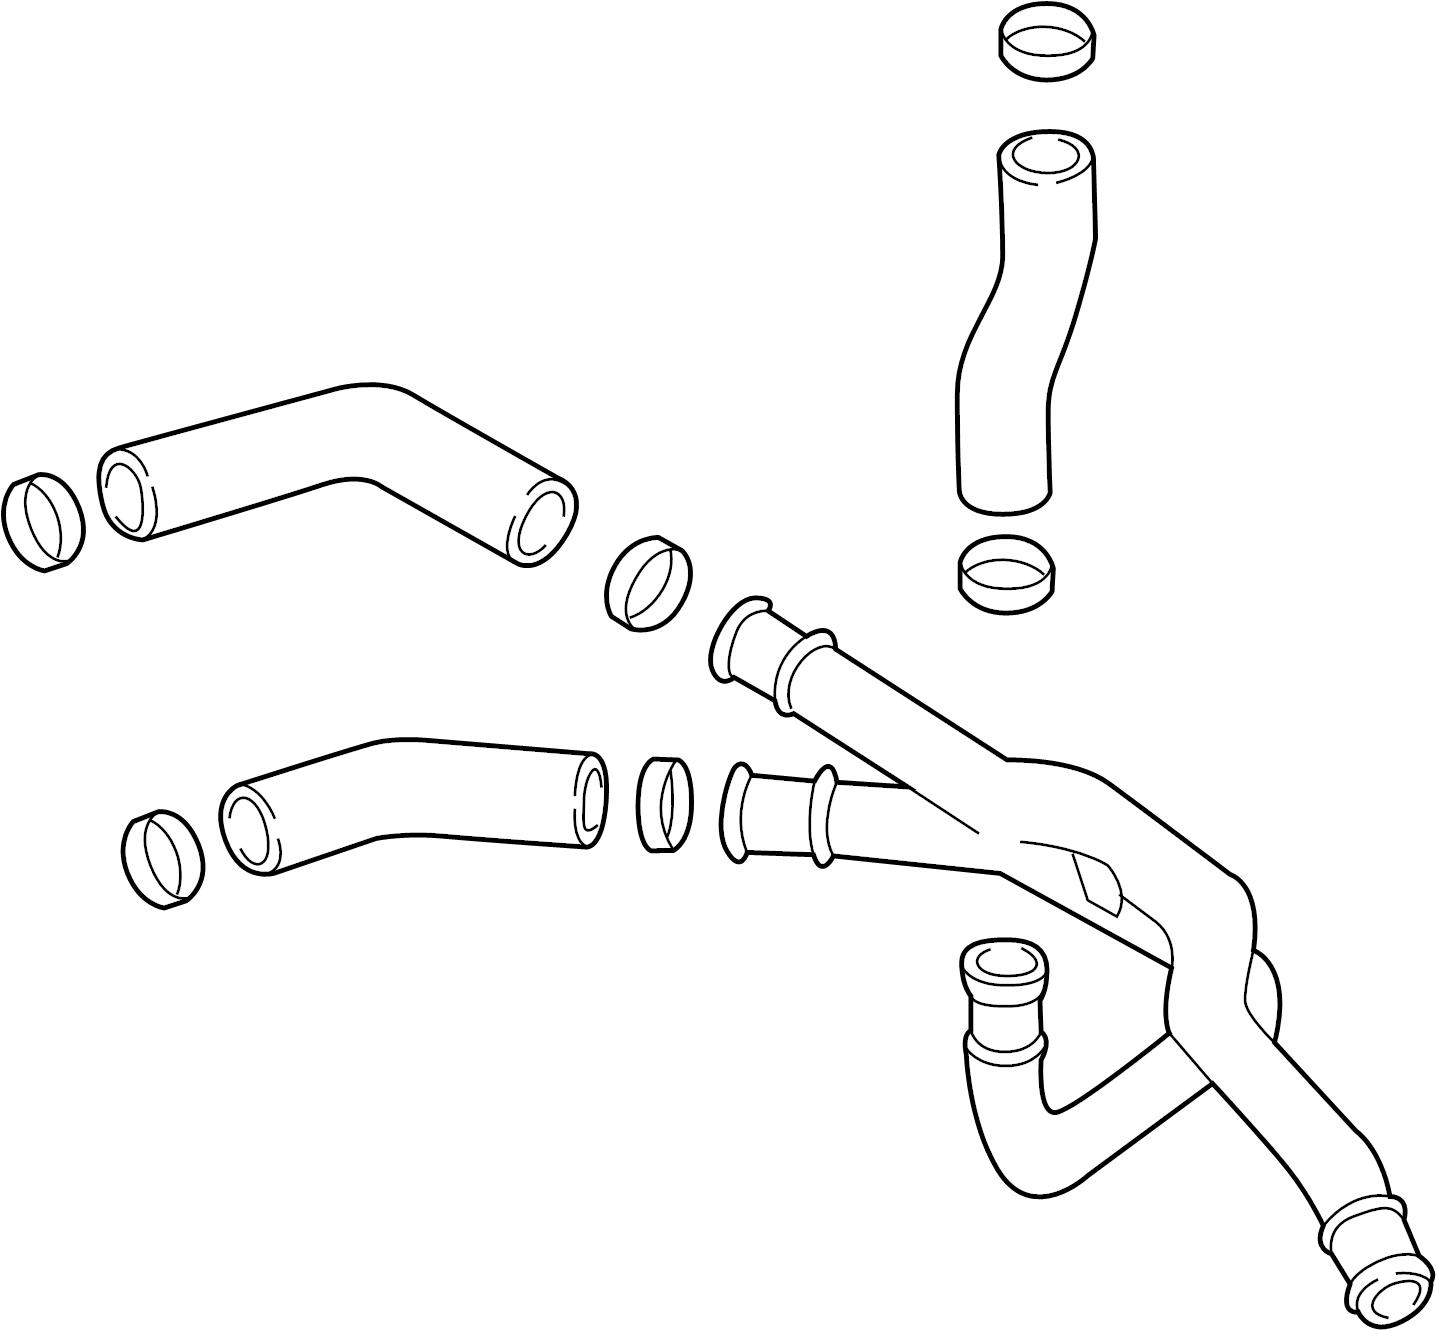 Mazda Mpv Oil  Cooler  Line  Engine  Tube  Assembly   Coolant Hose  2002-06